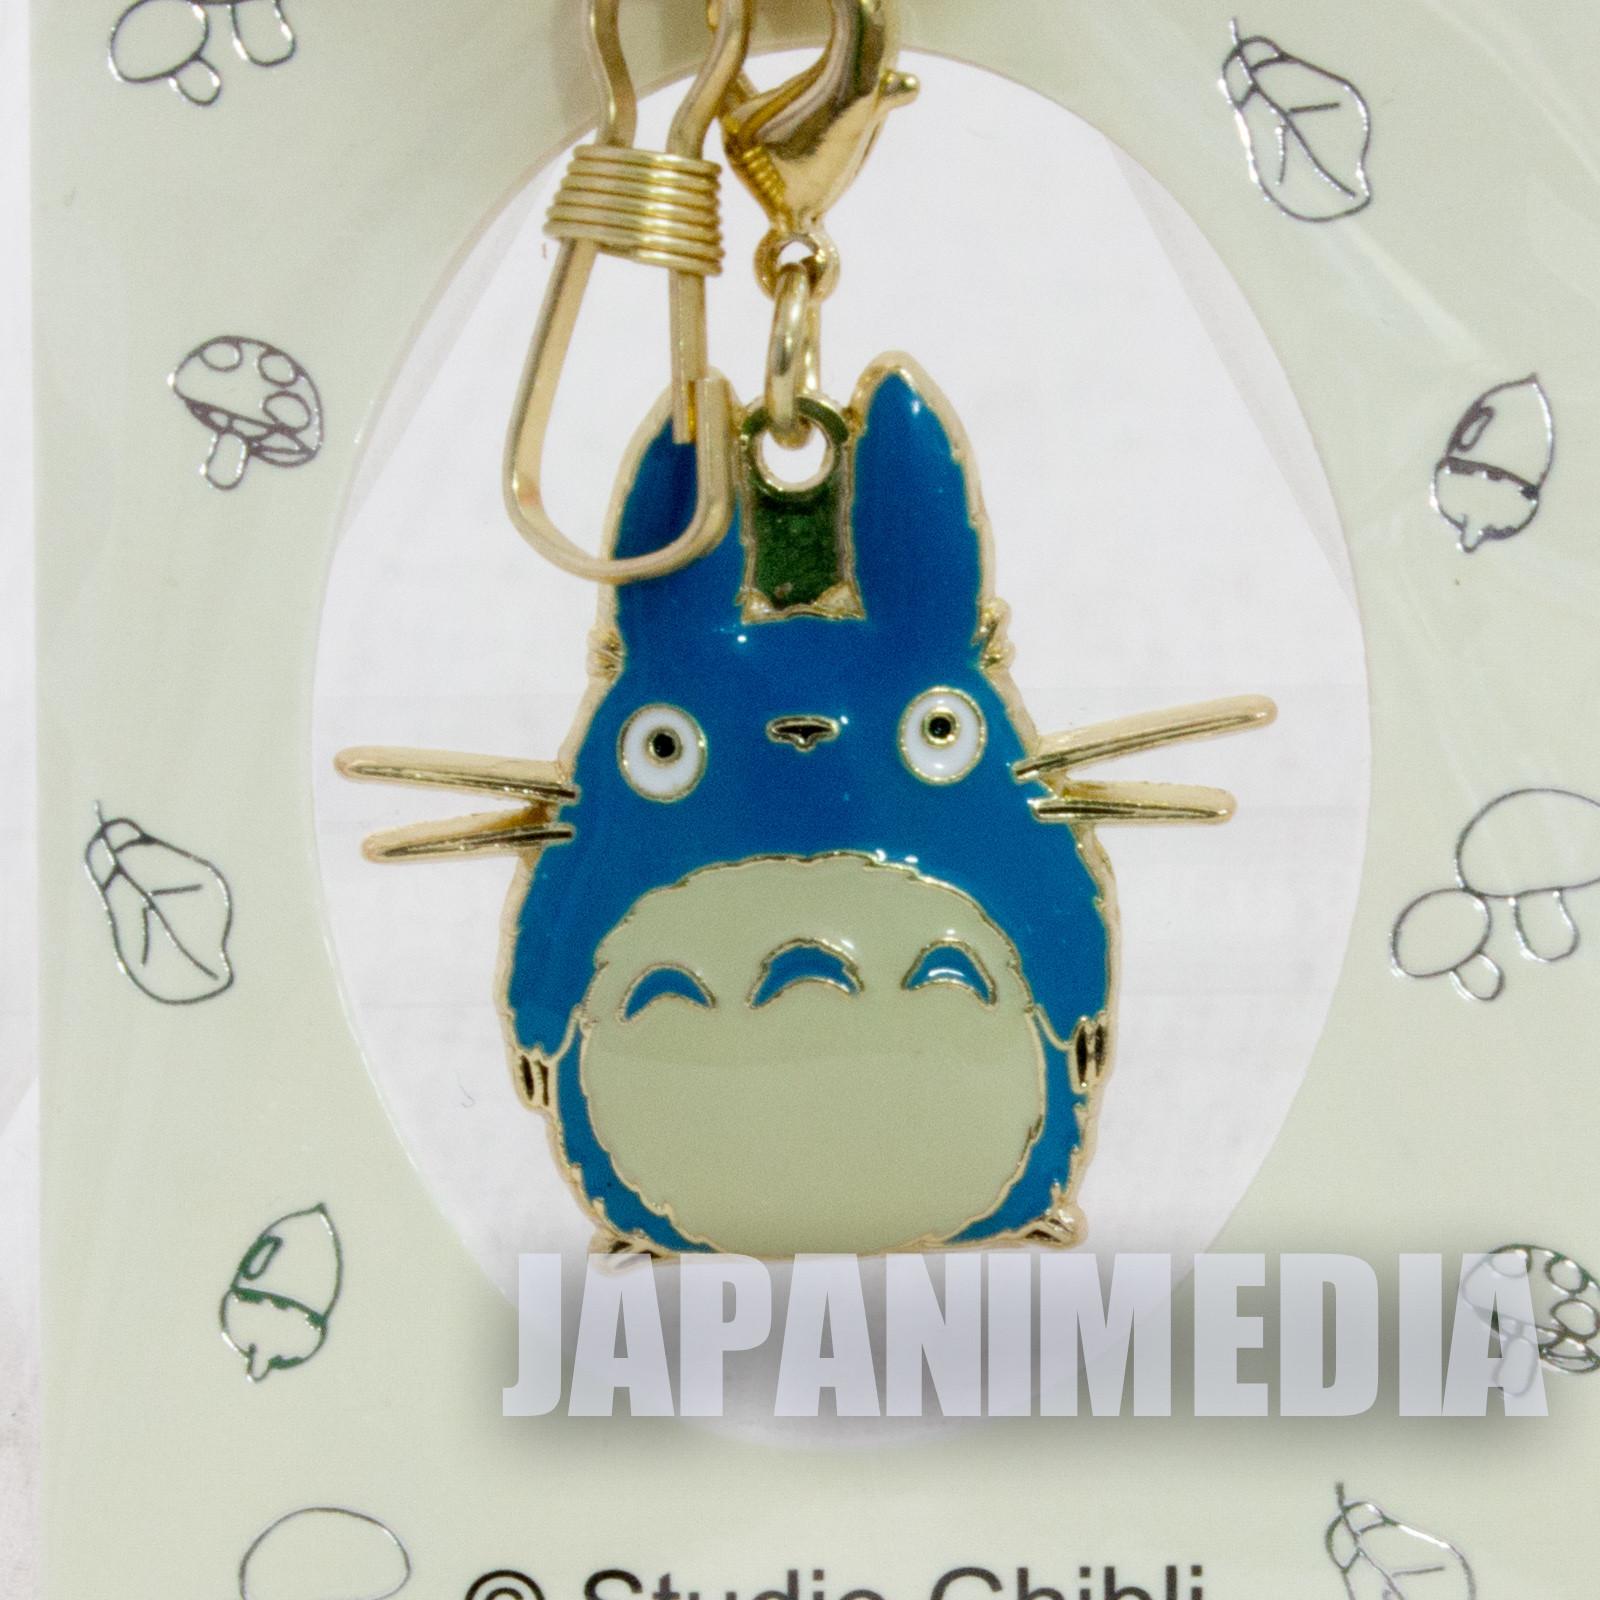 My Neighbor Totoro Mascot Charm Key Ring #3 Ghibli Hayao Miyazaki JAPAN